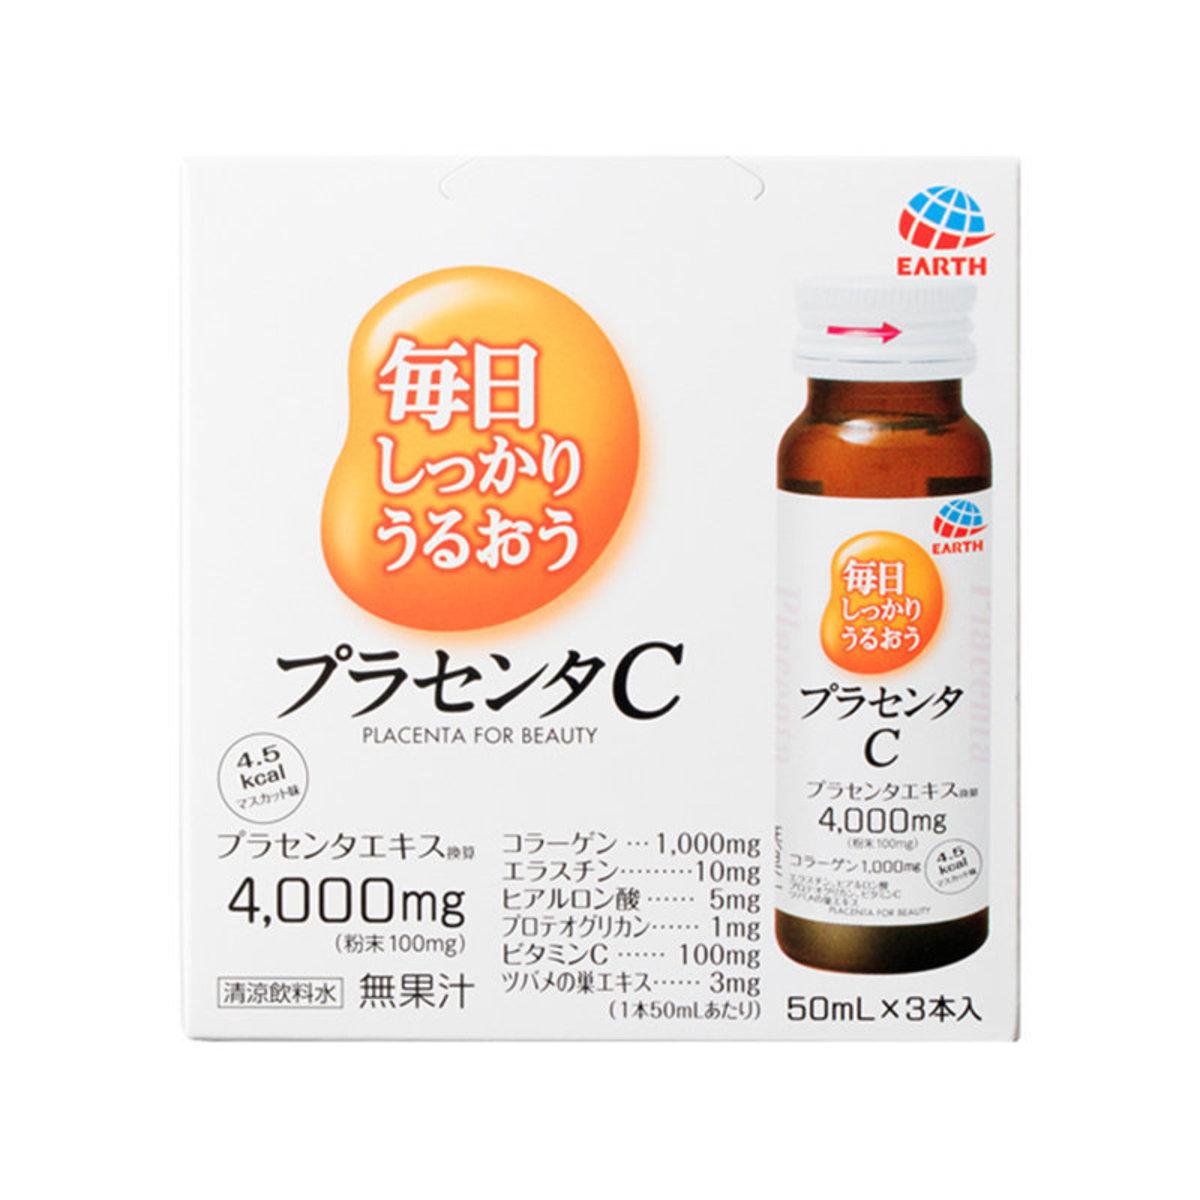 Beauty C Everyday Life Placenta C Drink 3 Bottles (Grape Flavour)